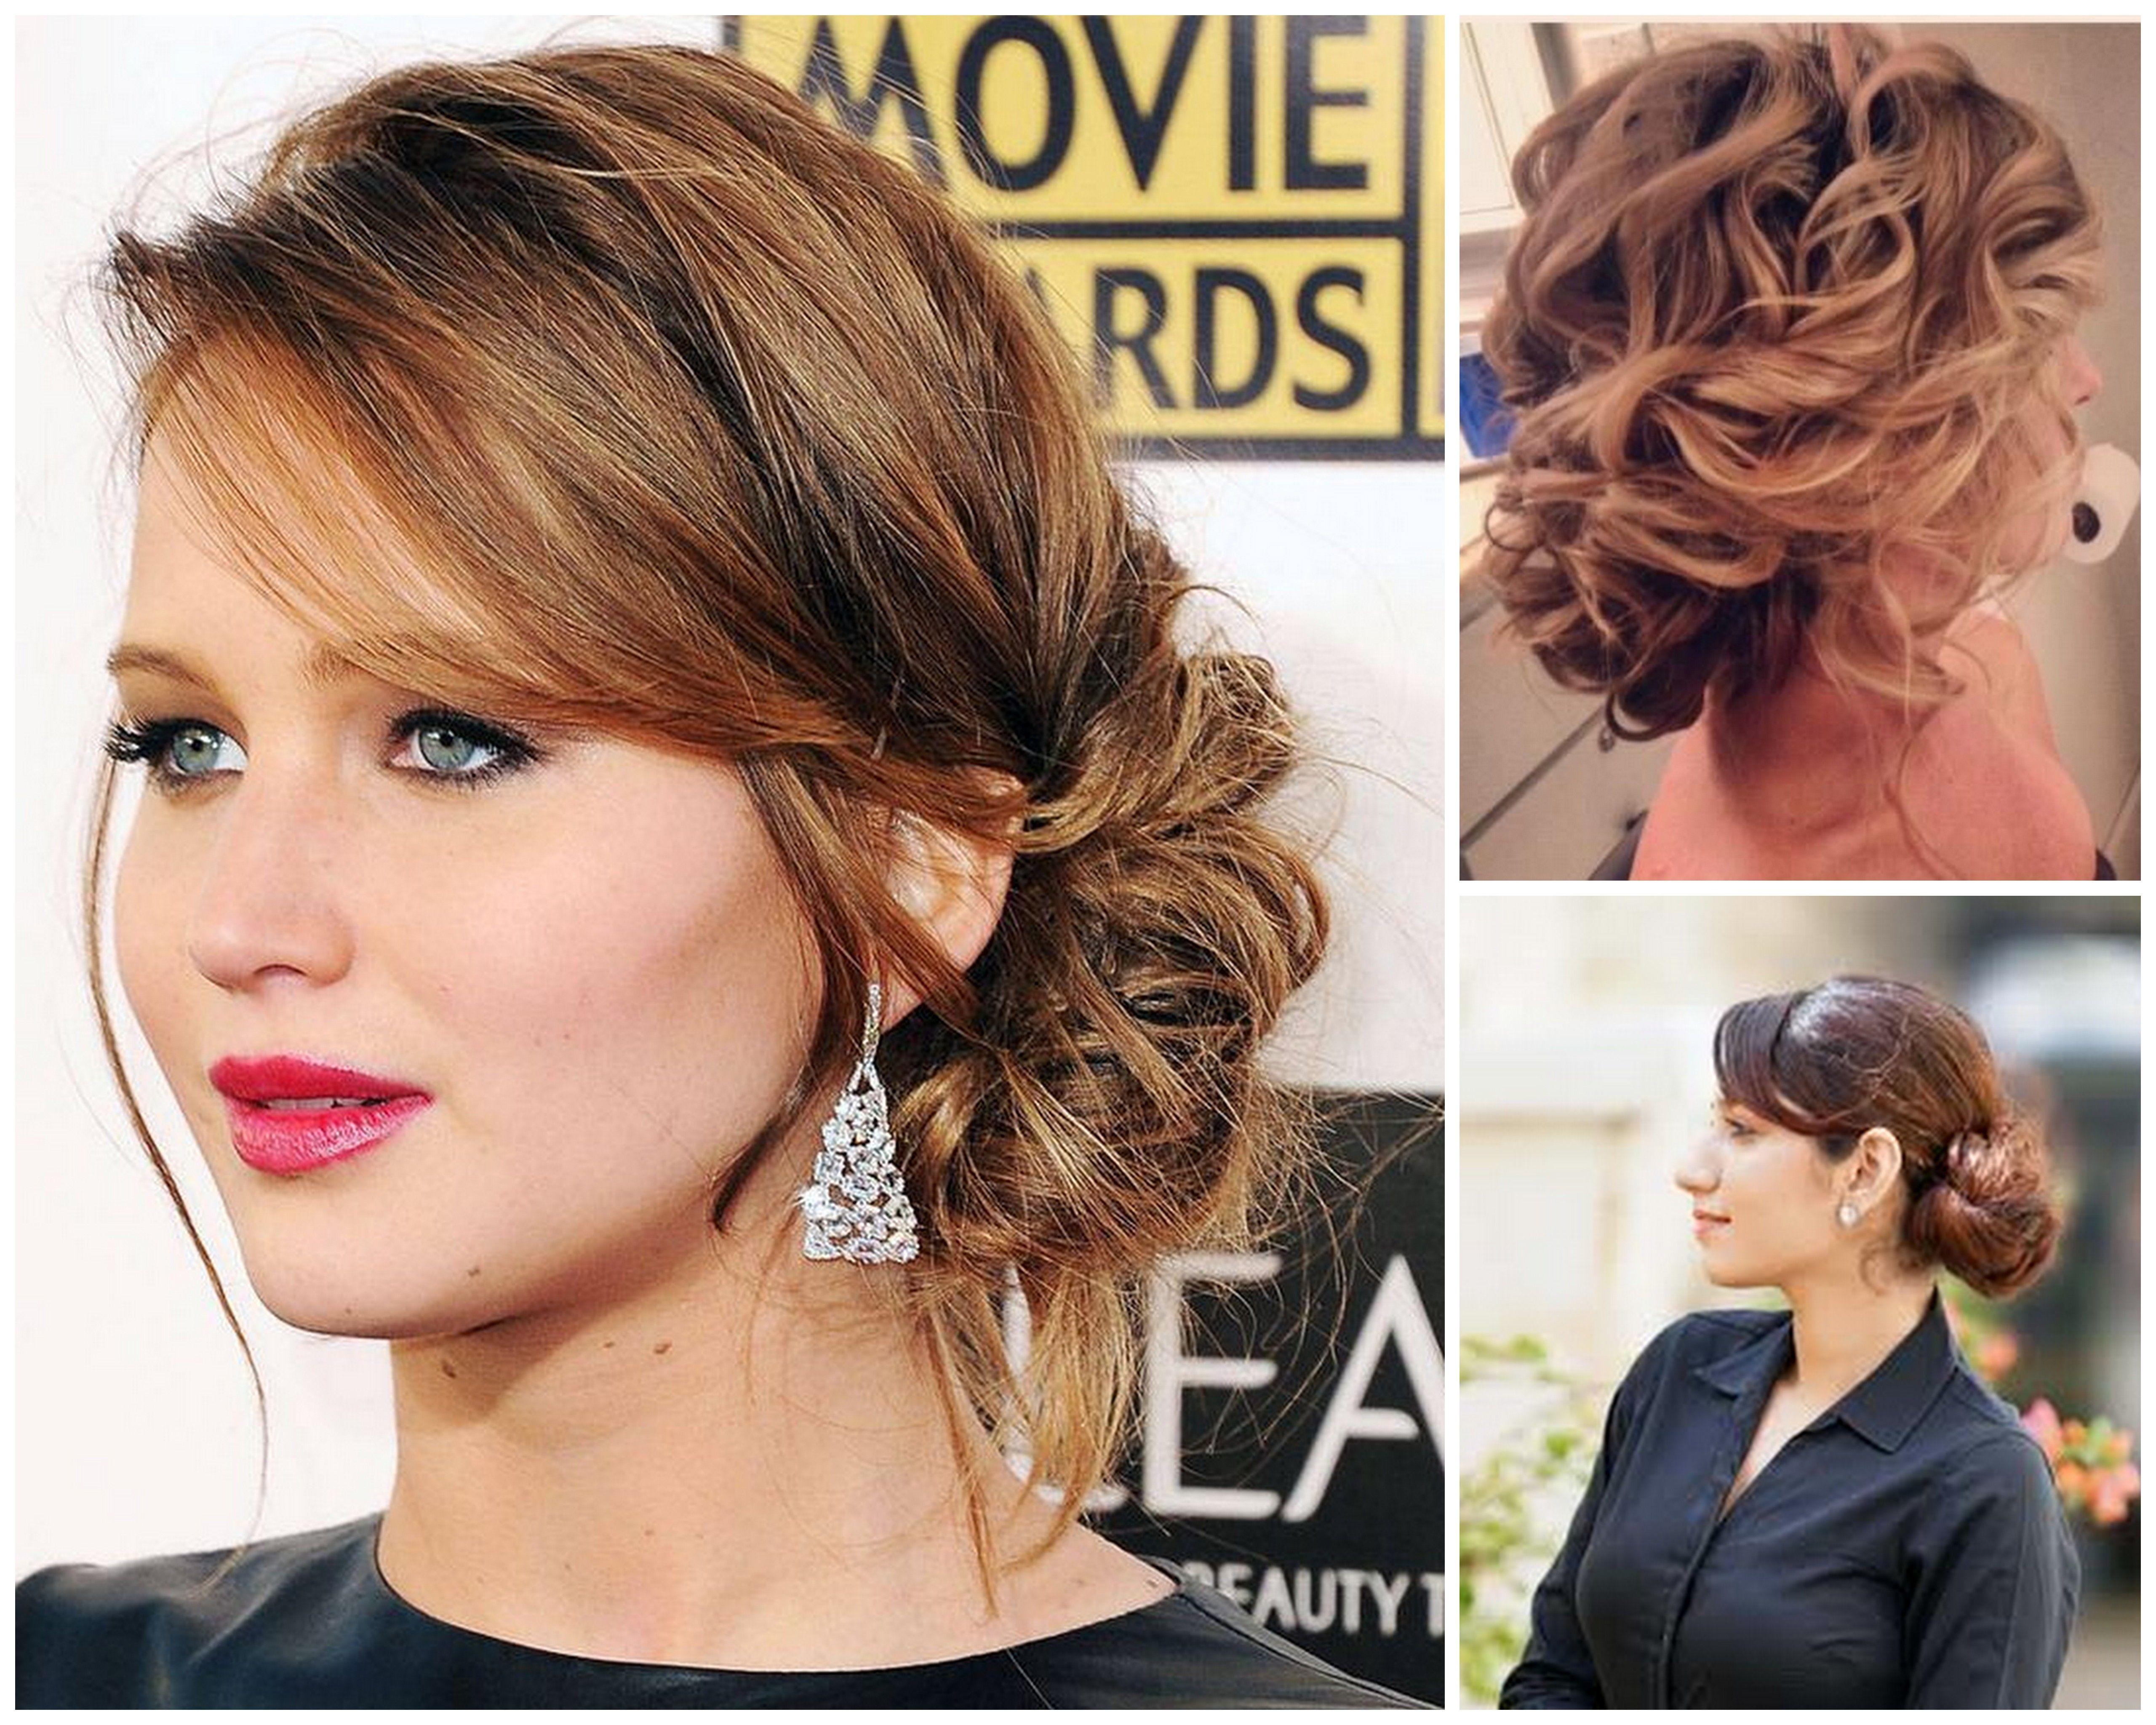 Classy How To Side Bun Hairstyles For Hair Do S To Try This Nye Thestylechair Side Bun Hairstyles Fine Hair Updo Hairdo